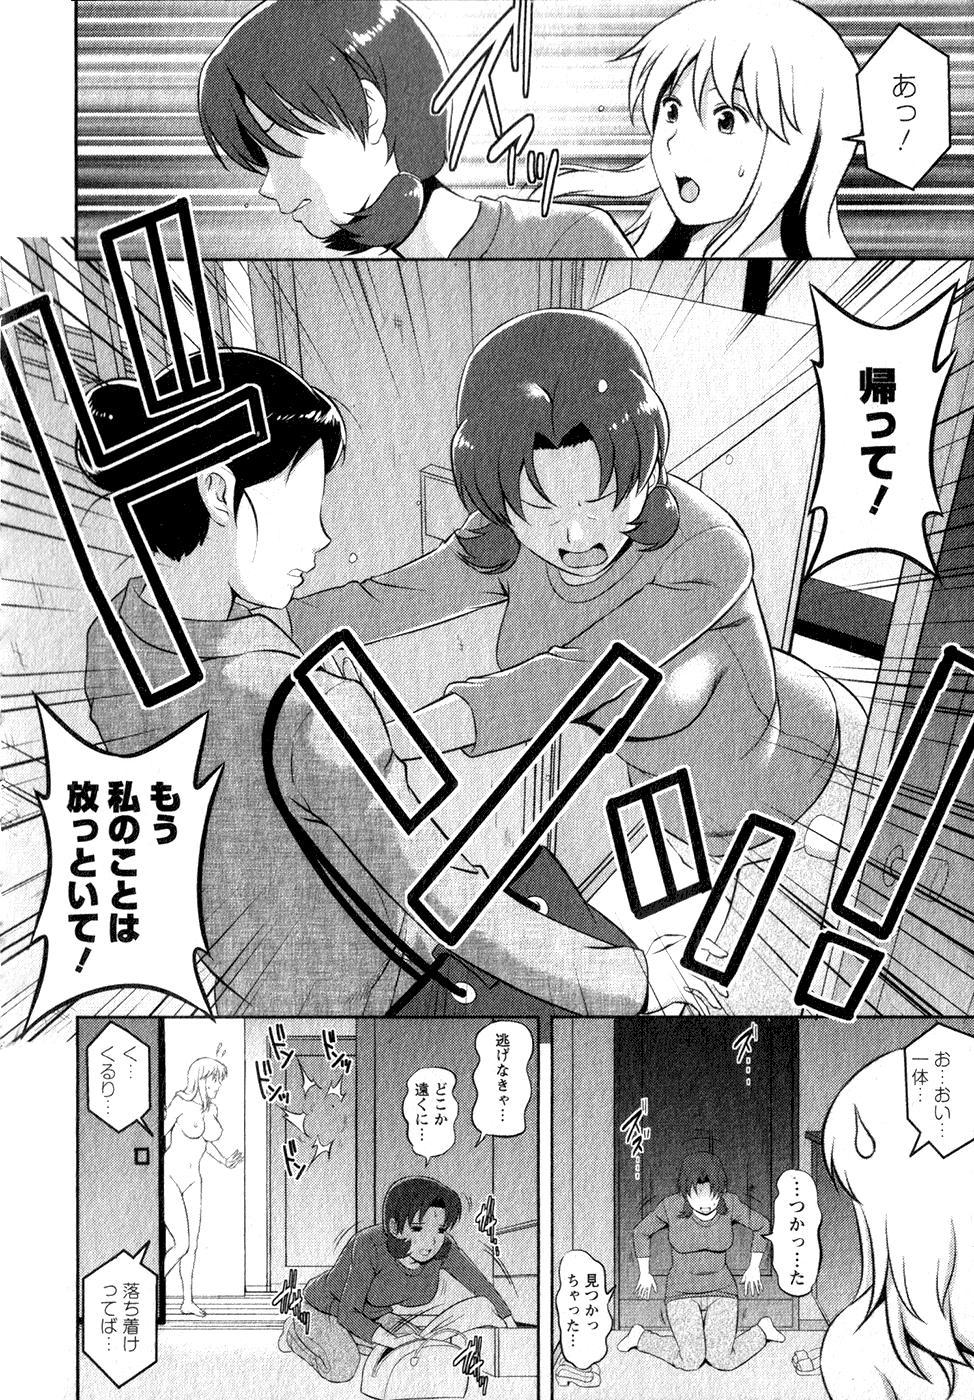 [Saigado] Kururi-san to Hirari-san Vol. 1 (Complete) 182